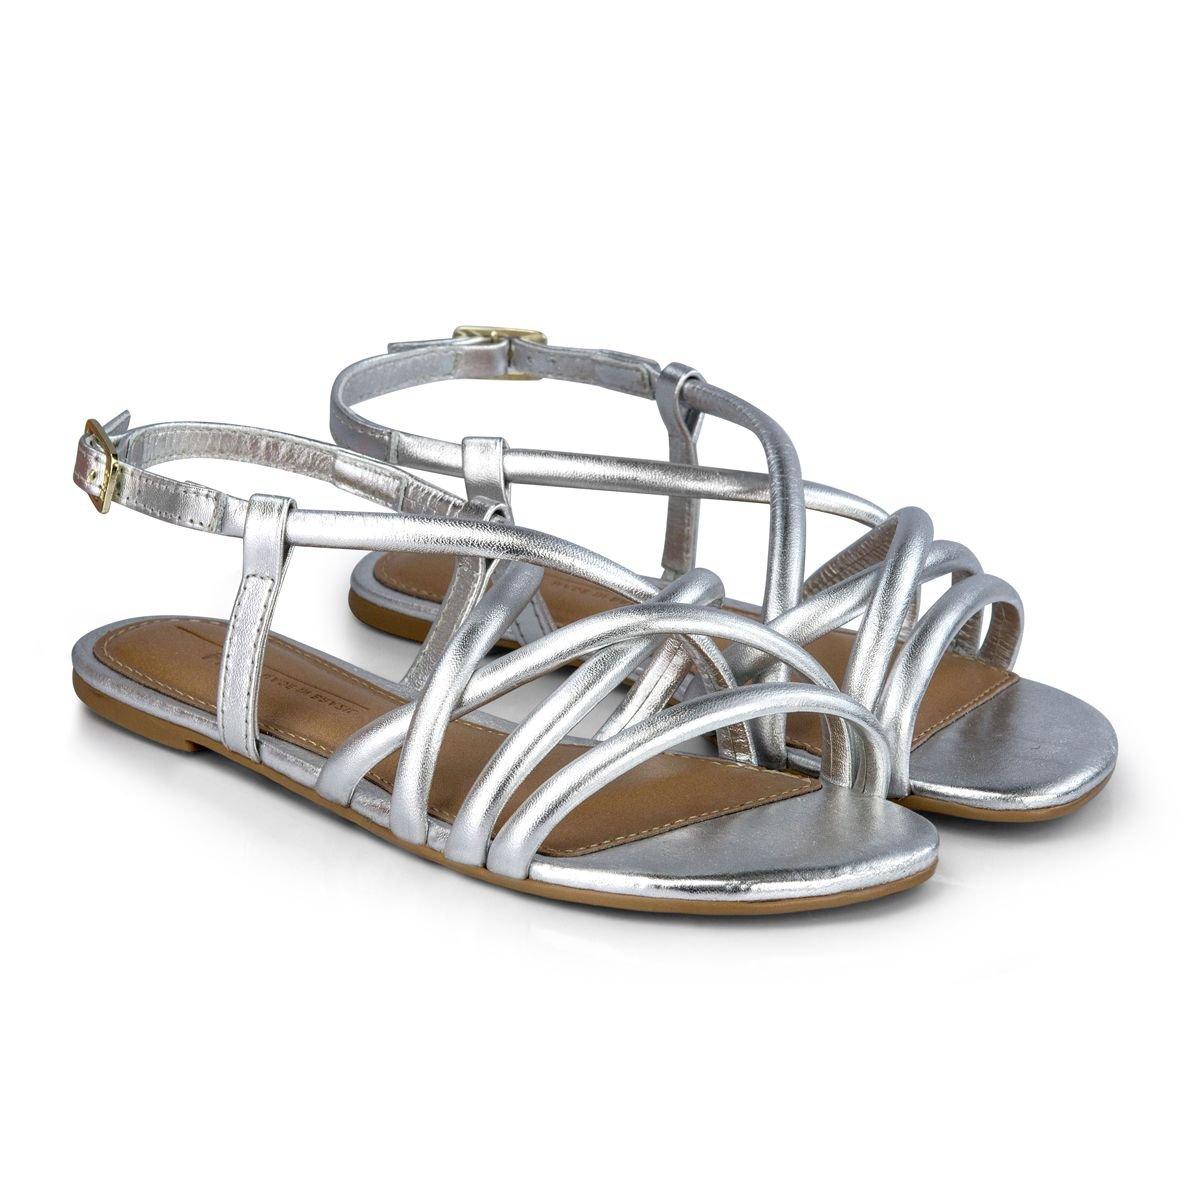 Sandale din piele Bibi Shoes Little Me, Argintiu